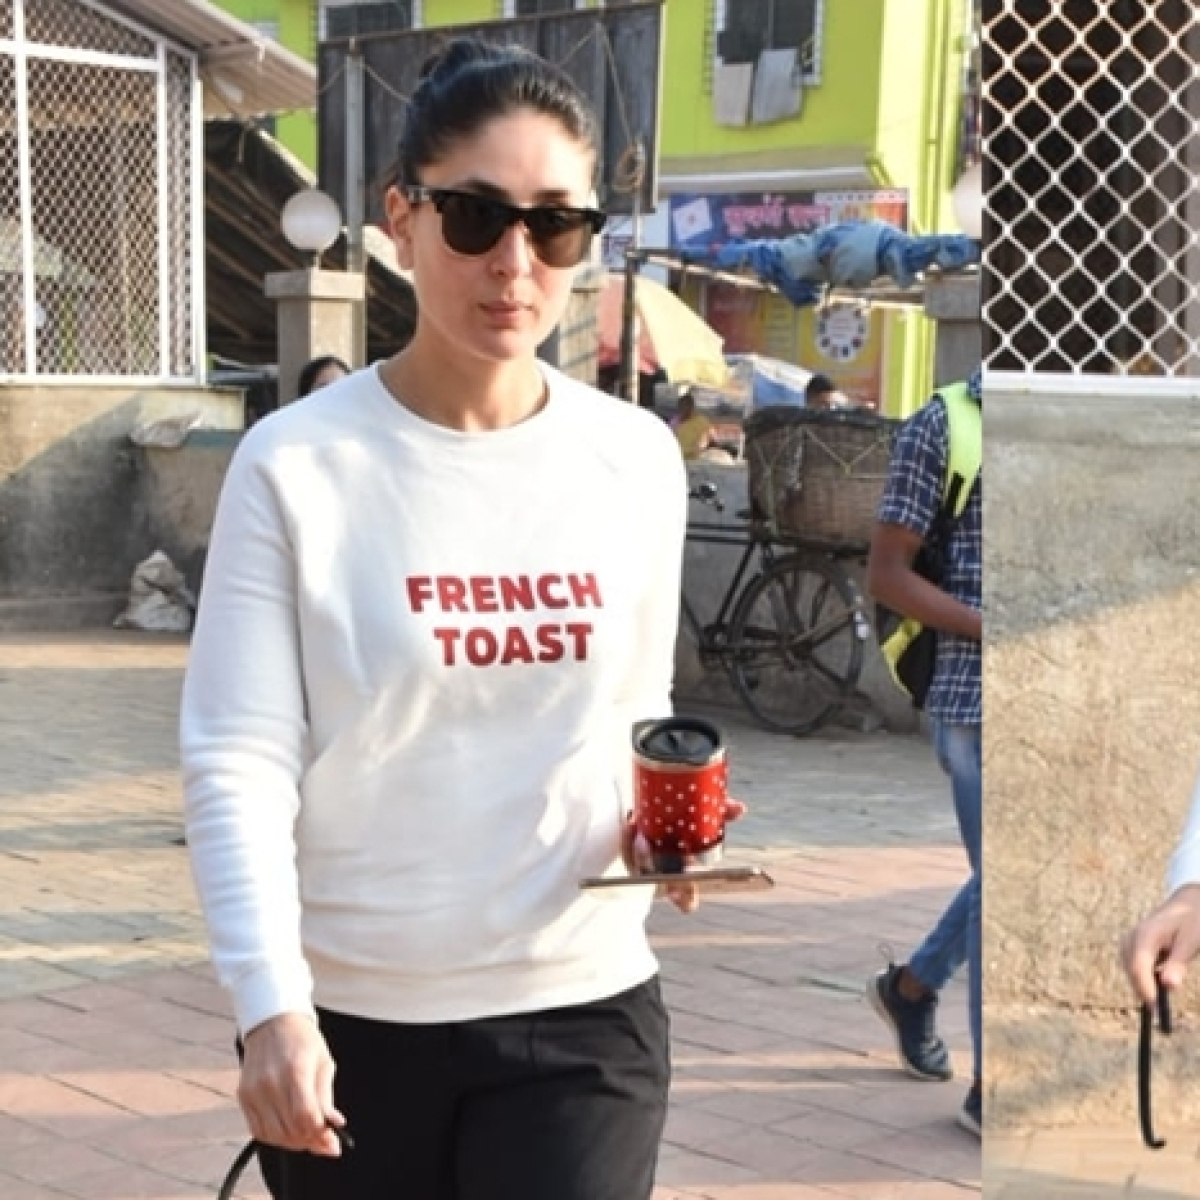 Kareena Kapoor's designer 'French Toast' sweatshirt isn't that expensive